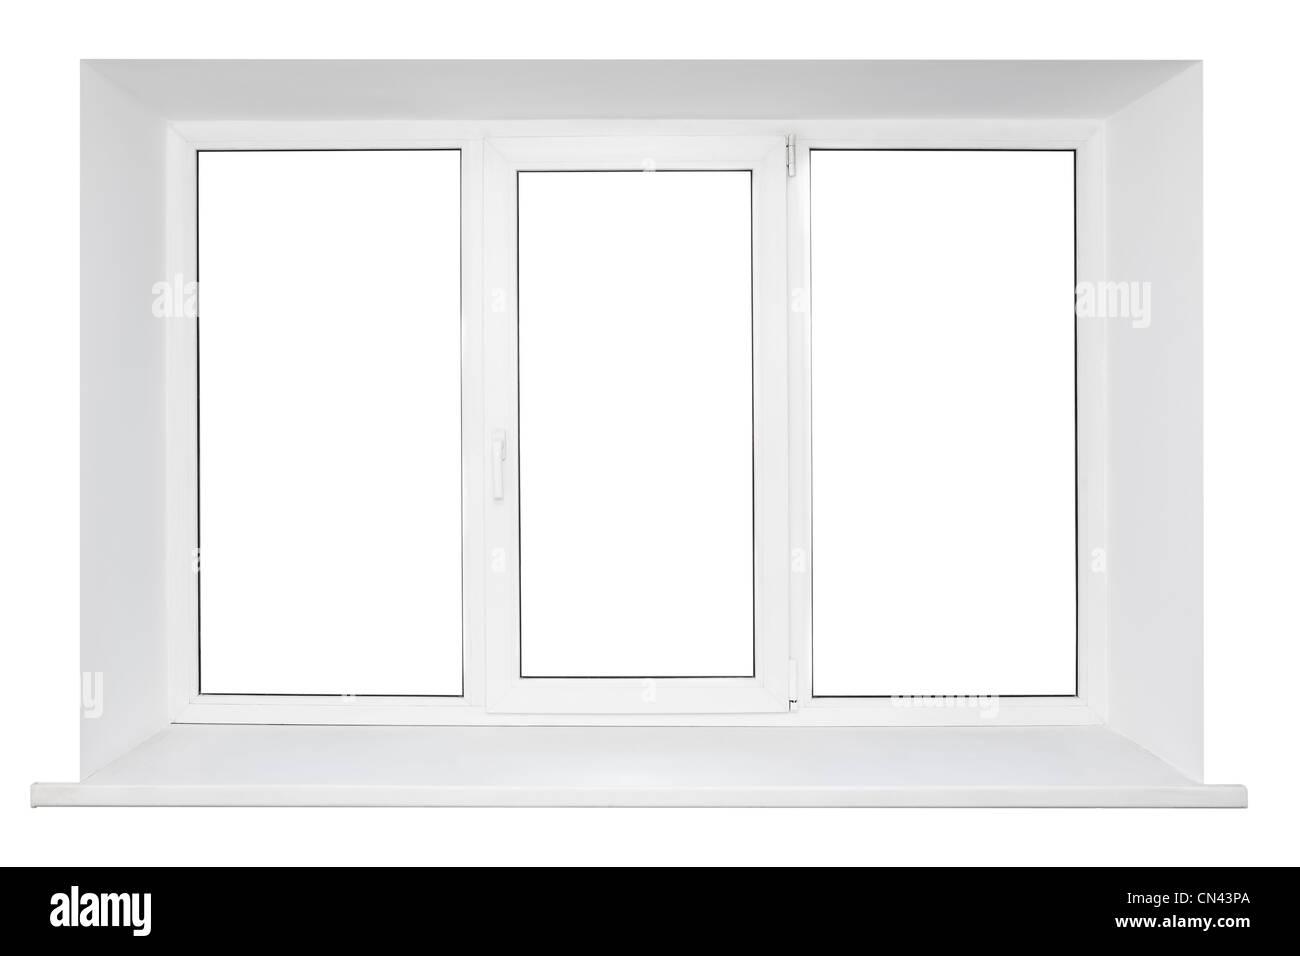 White plastic triple doors window frame with windowsill isolated on ...